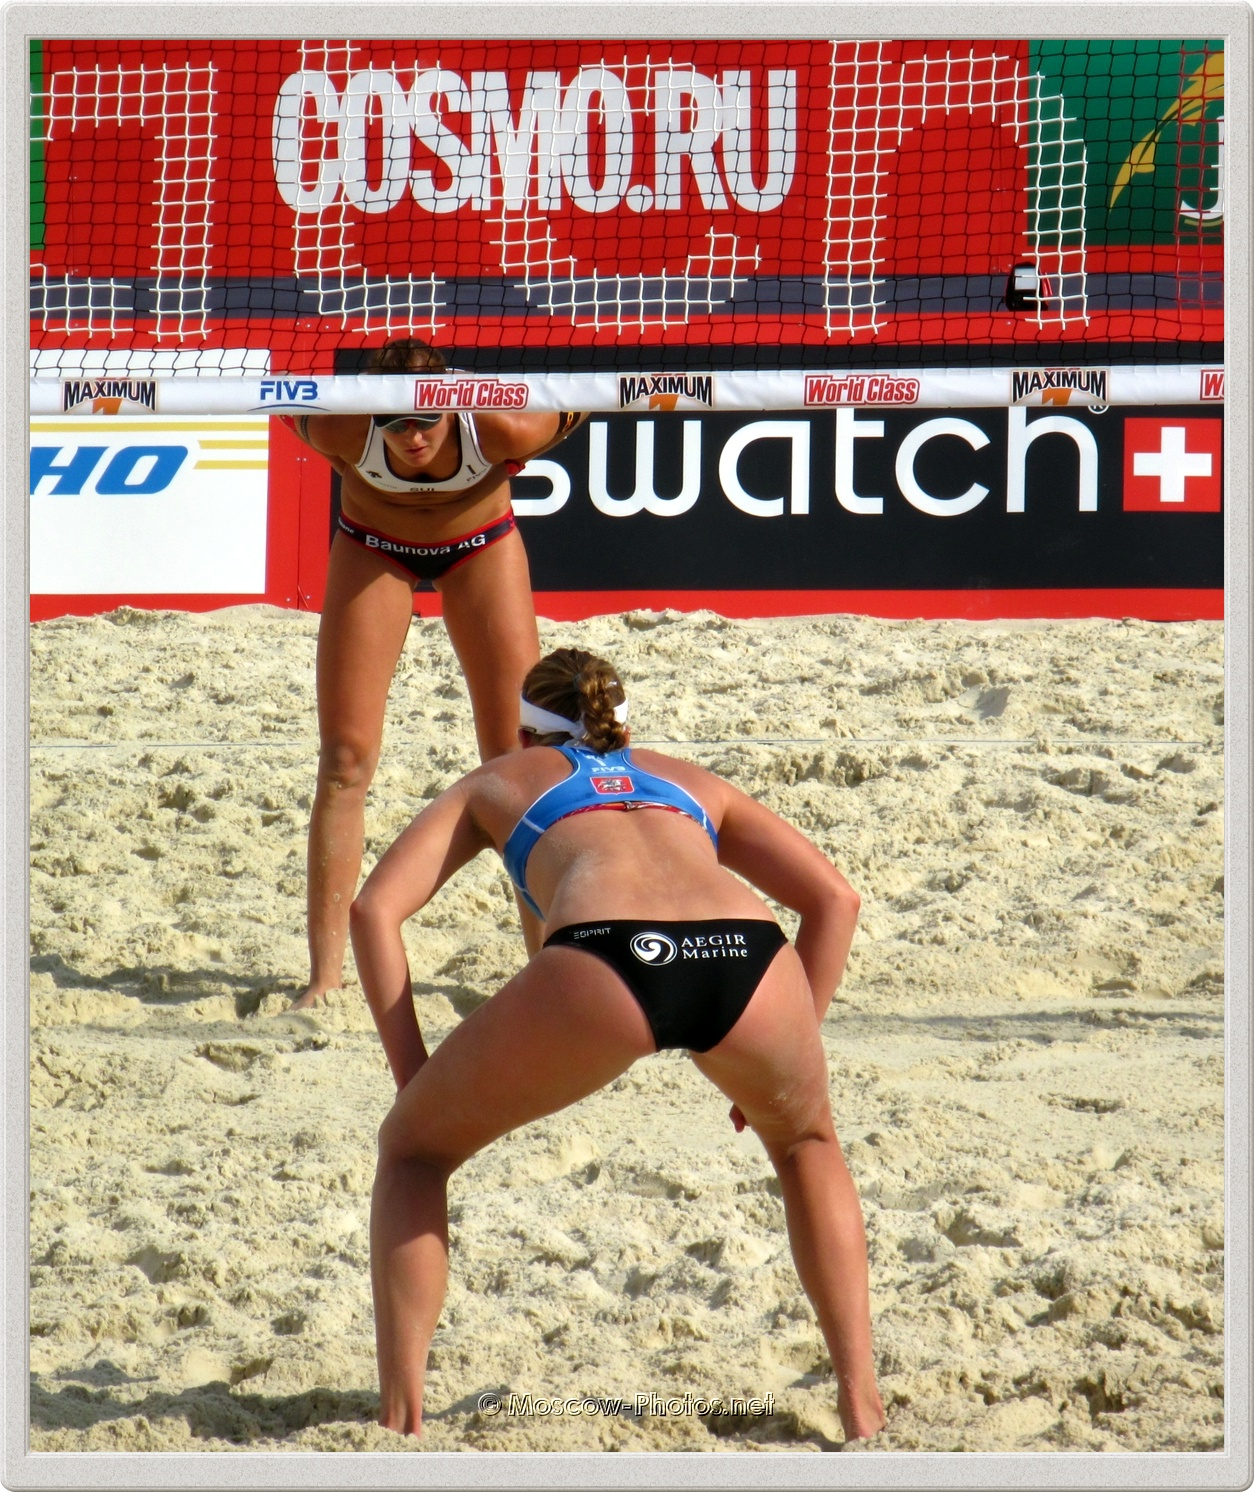 Roos Van der Hoeven (NED) vs Simone Kuhn (SU)